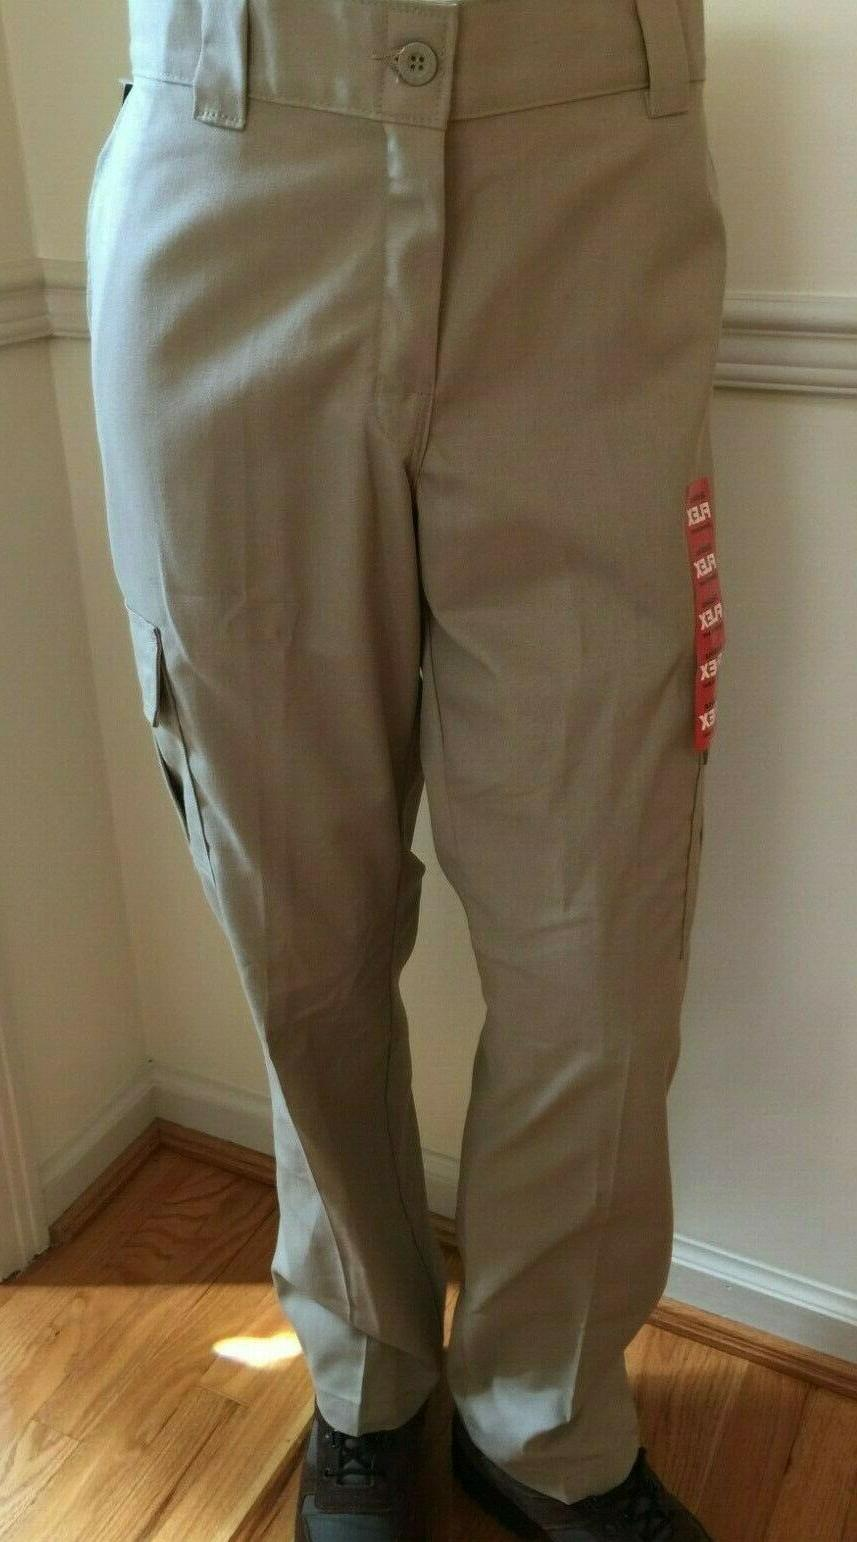 NWT Flex WP595 DP Dickies Work Uniform Cargo Pants Slacks Tan